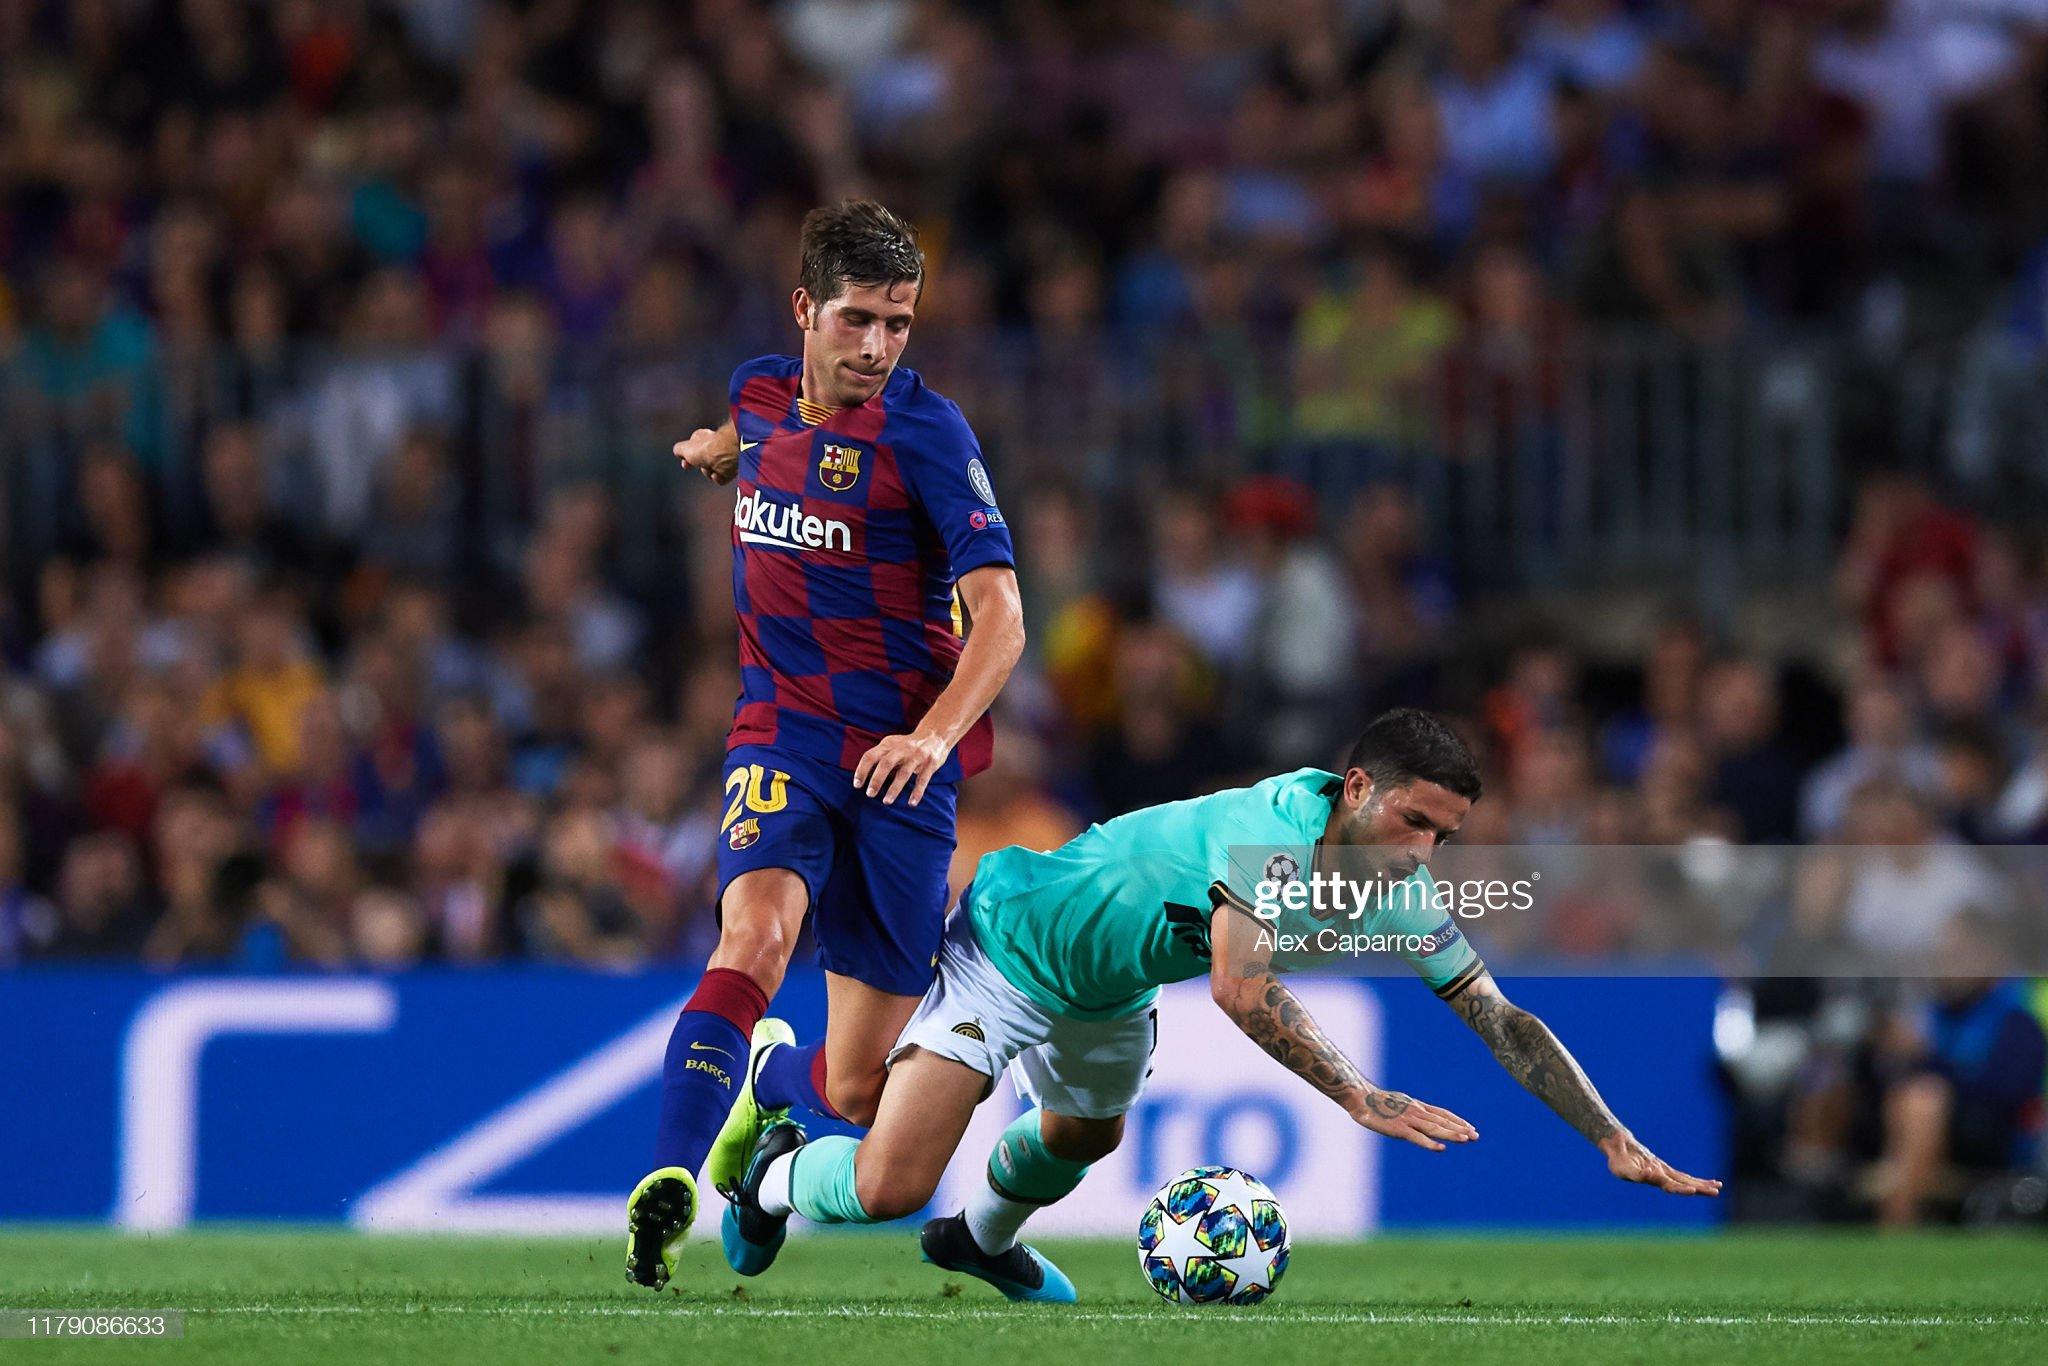 صور مباراة : برشلونة - إنتر 2-1 ( 02-10-2019 )  Stefano-sensi-of-inter-fights-for-the-ball-with-sergi-roberto-of-fc-picture-id1179086633?s=2048x2048